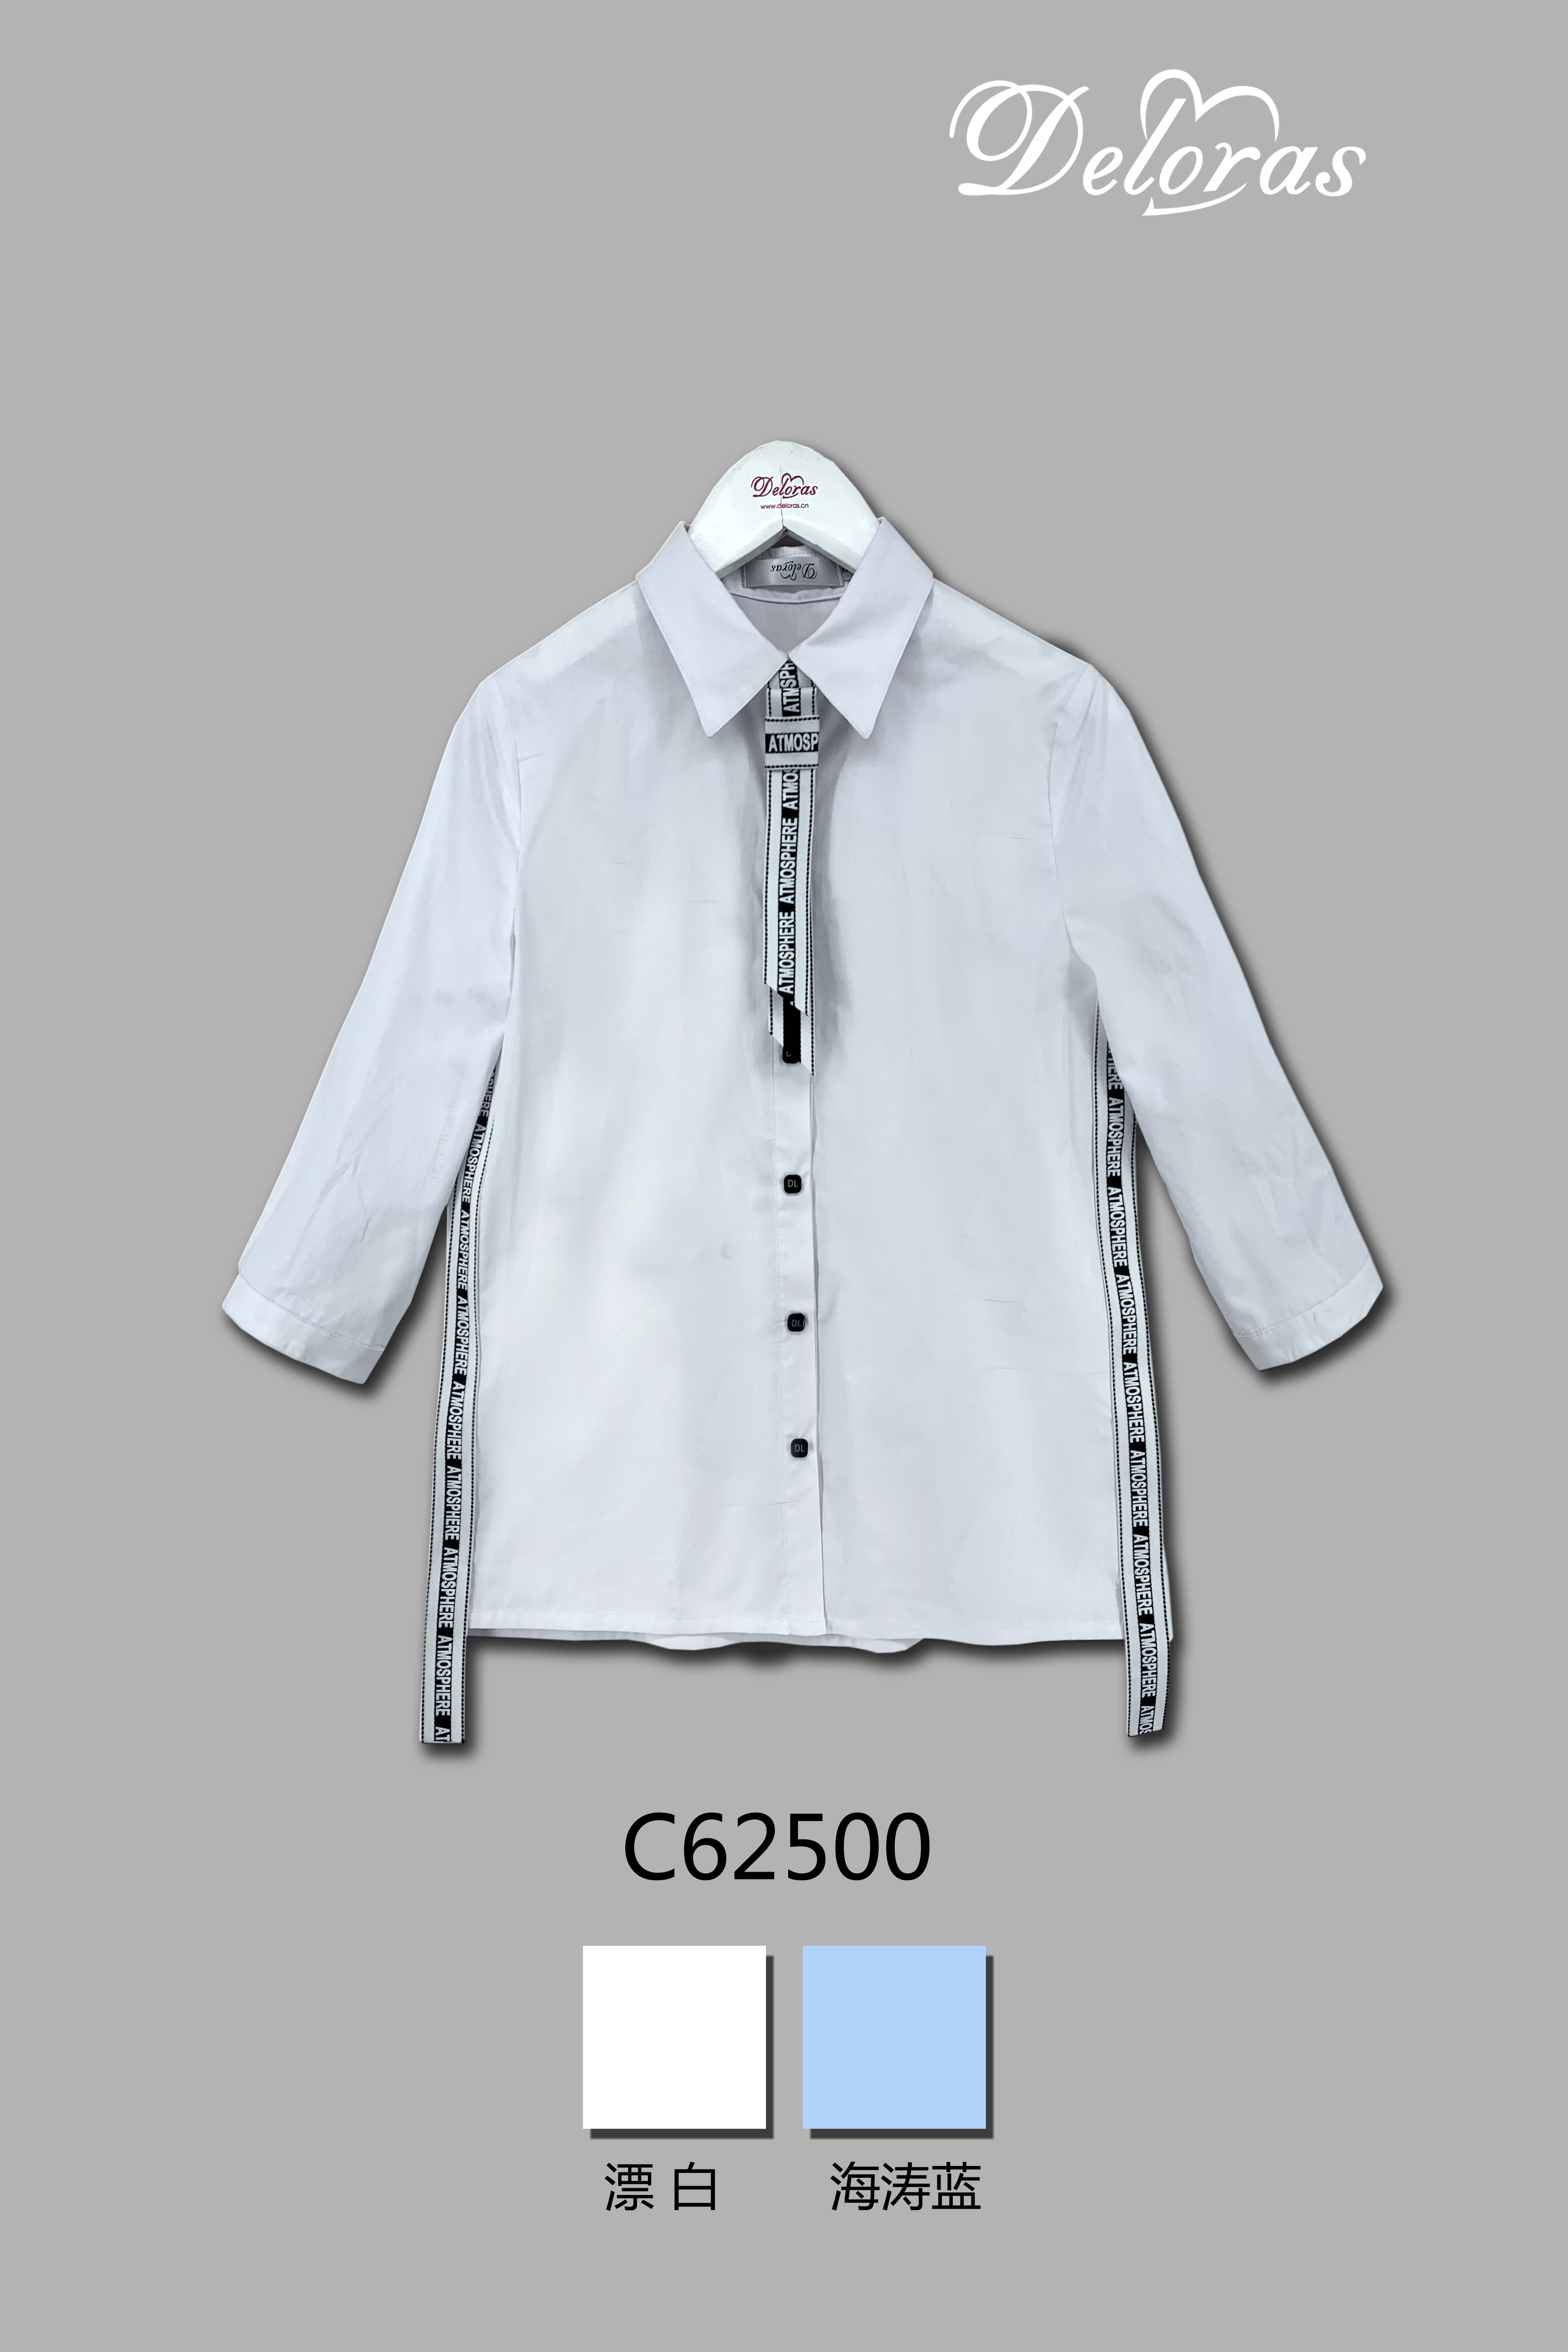 Блузка для девочки BHDL62500